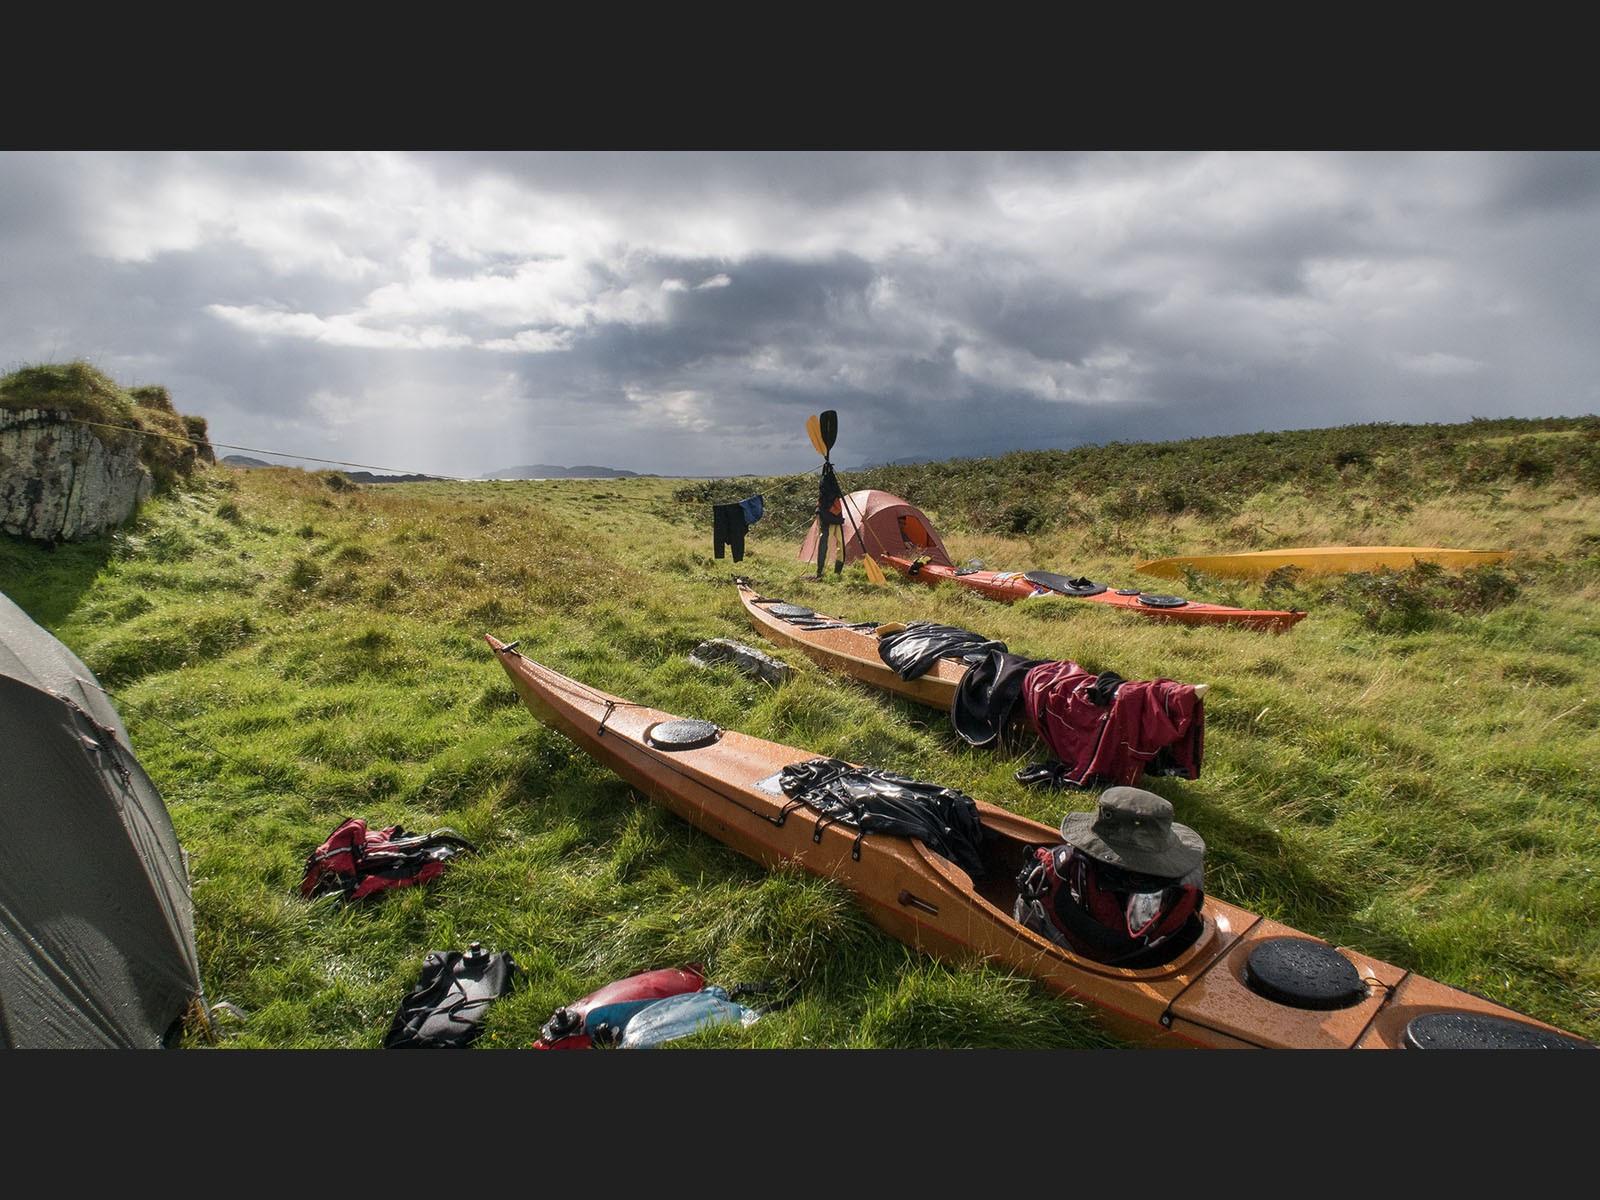 IMG_0552 stormy camp on goat island